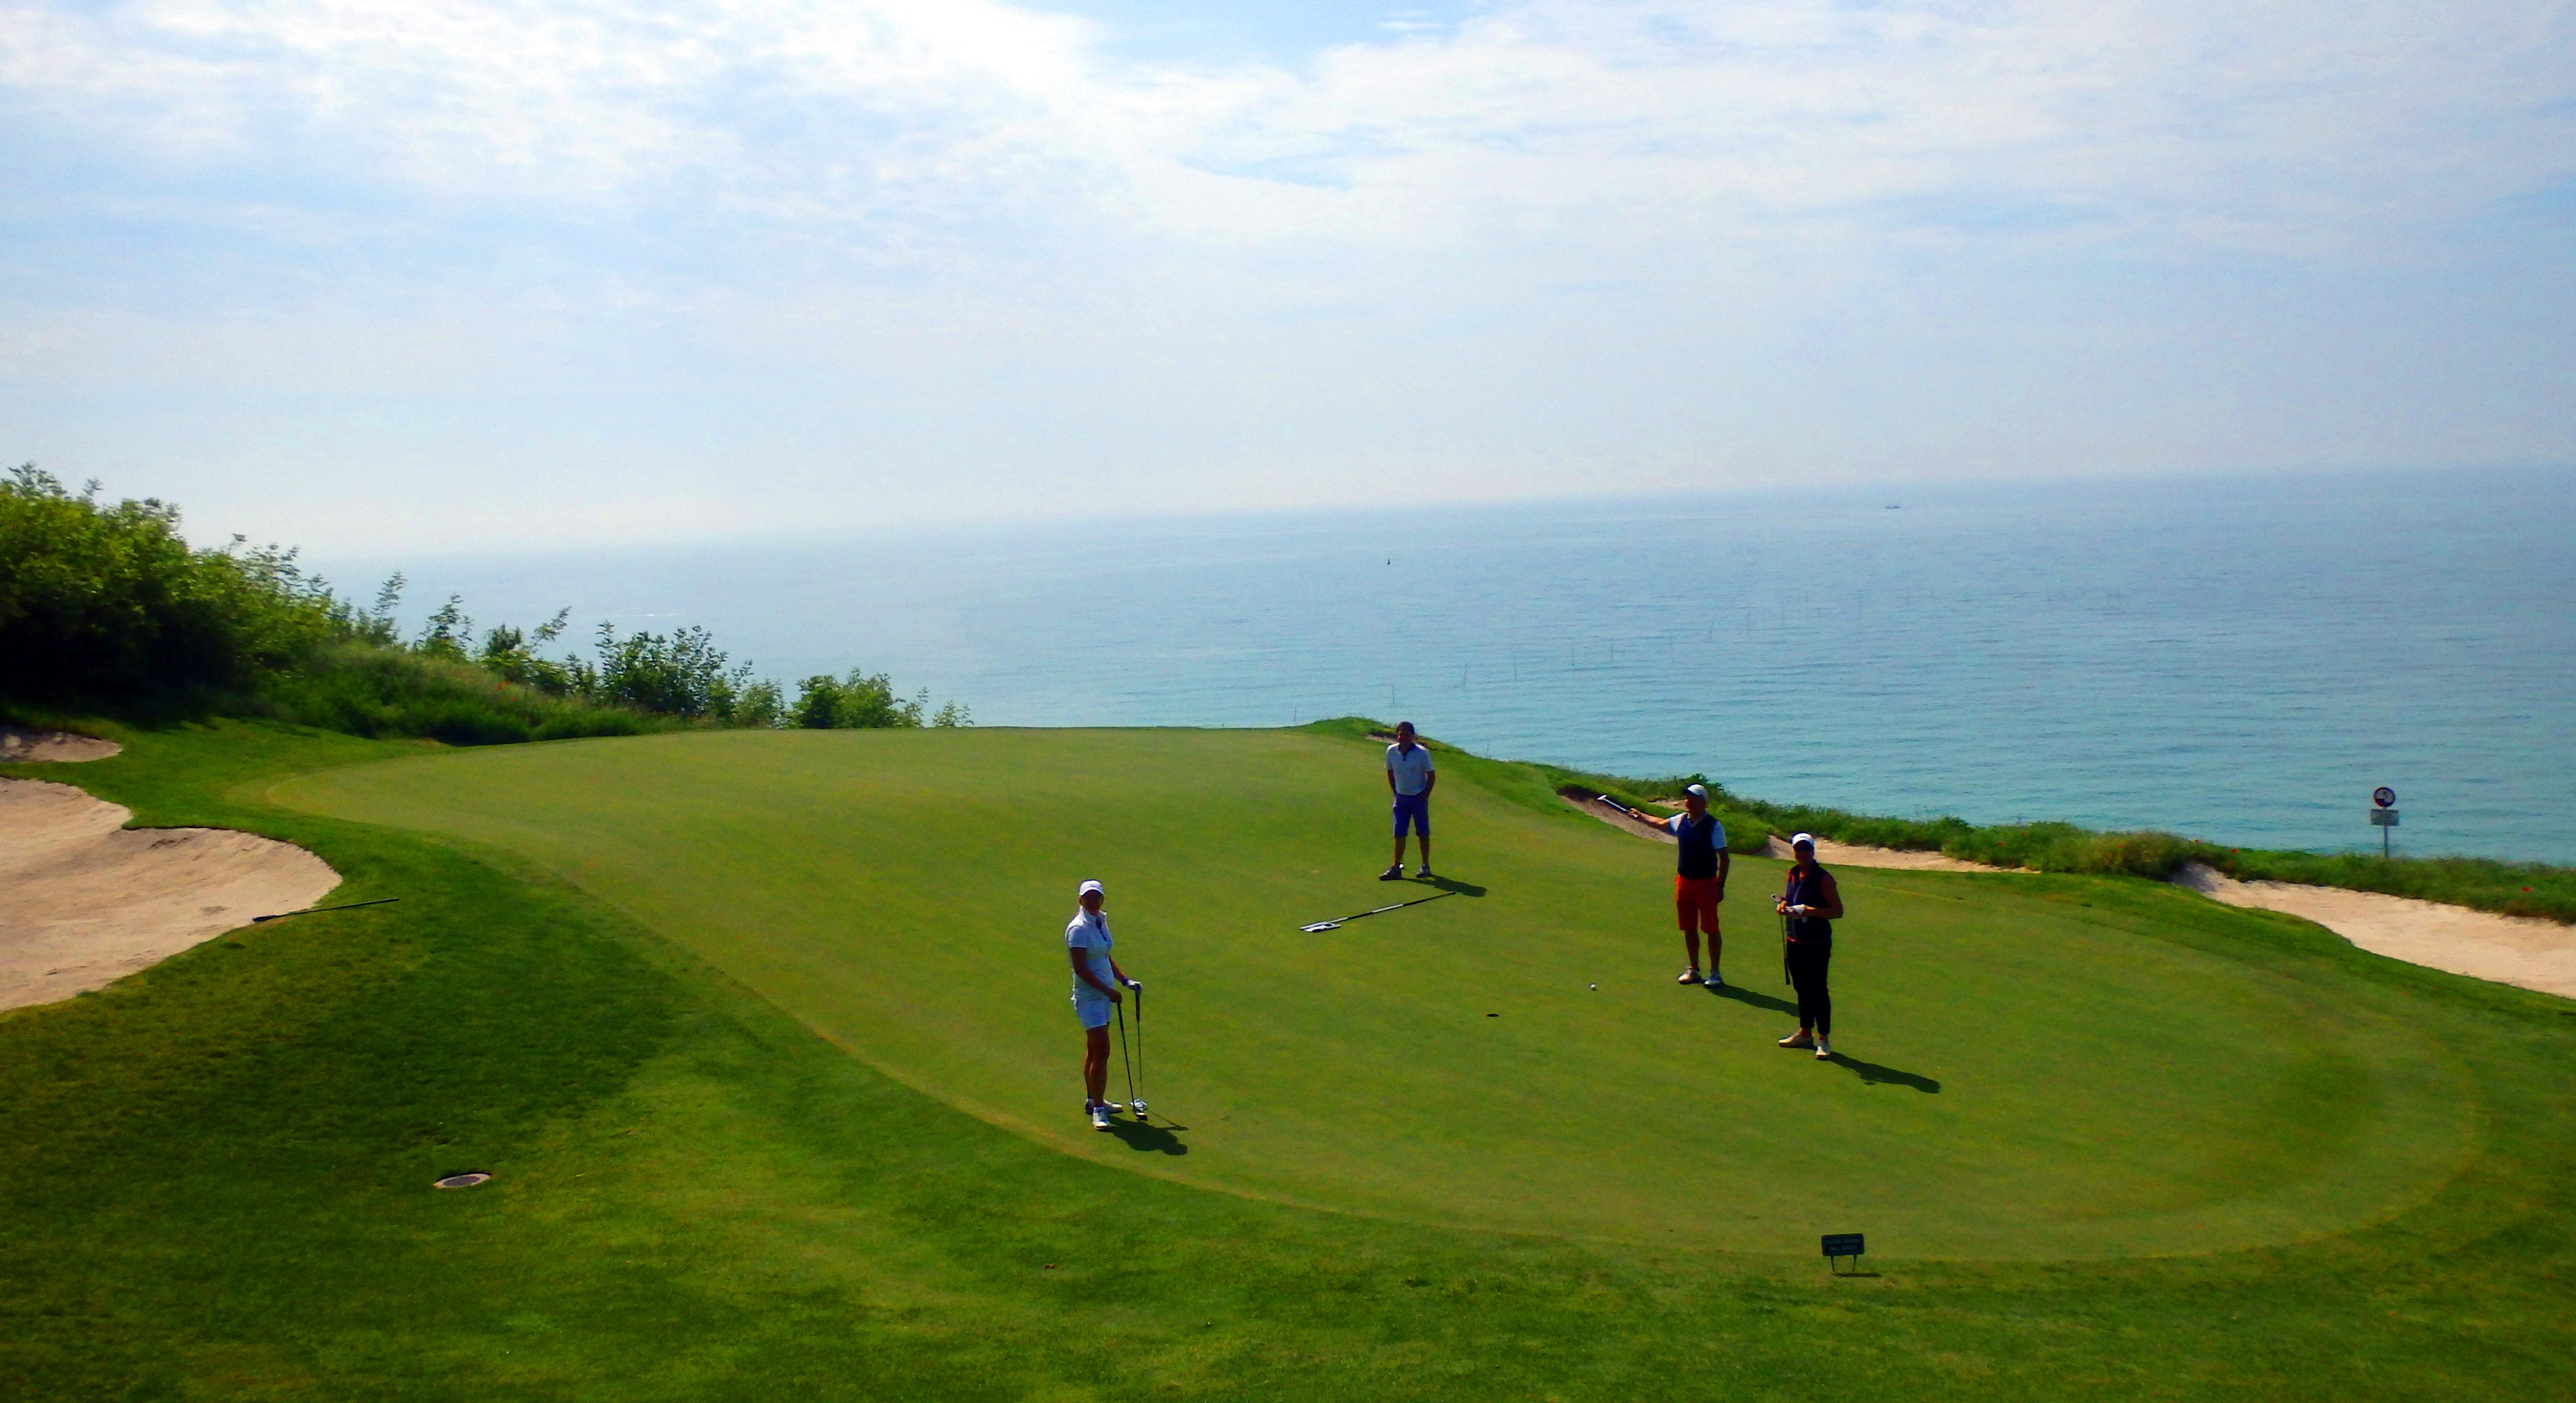 Golf-Bulharsko-Thracian-Cliffs-hole-in-one